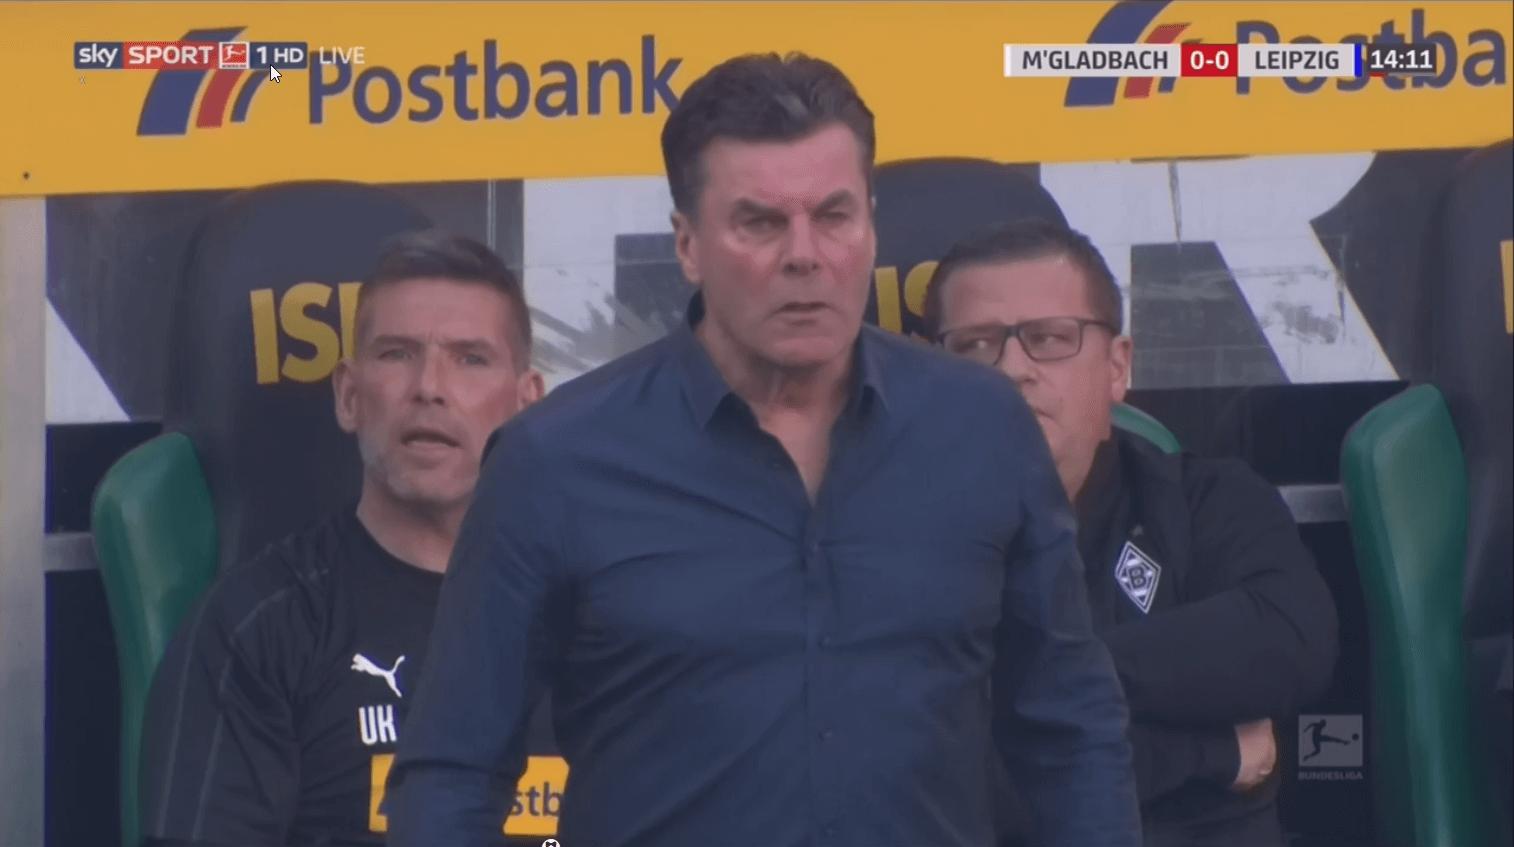 Gladbach RB Leipzig Bundesliga tactical analysis